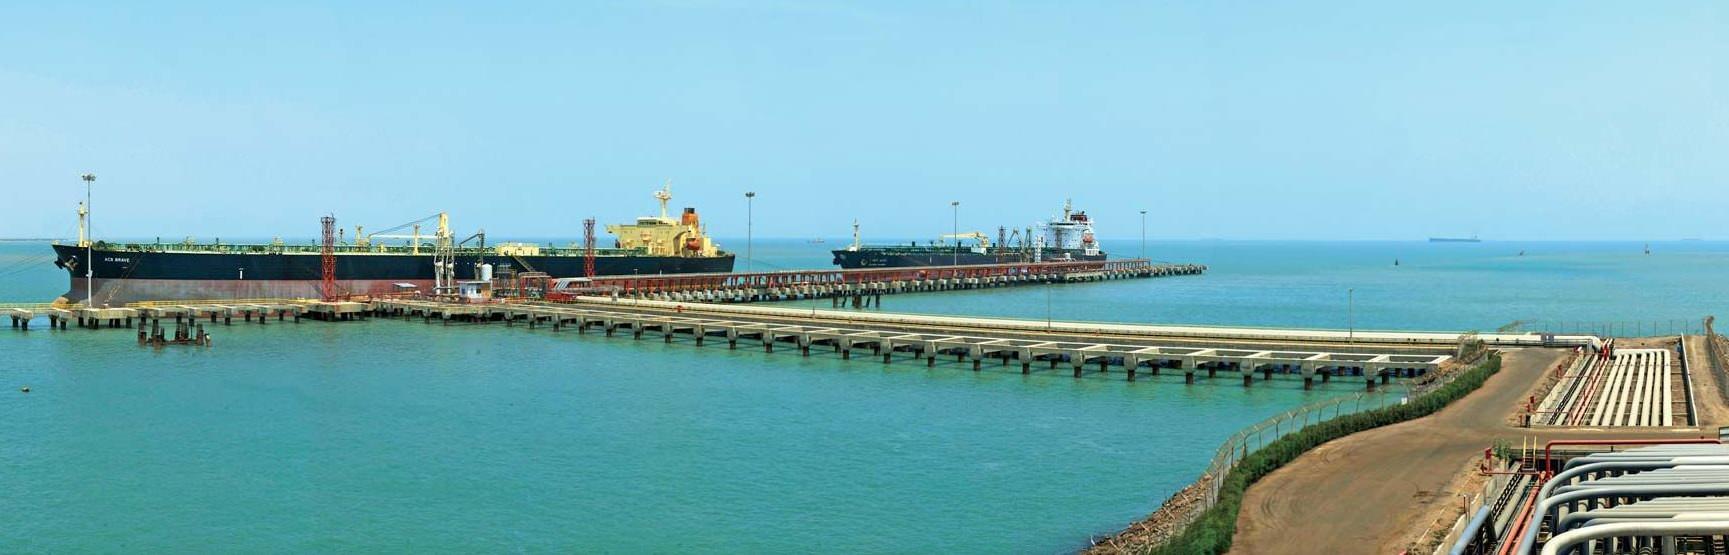 major harbour in india